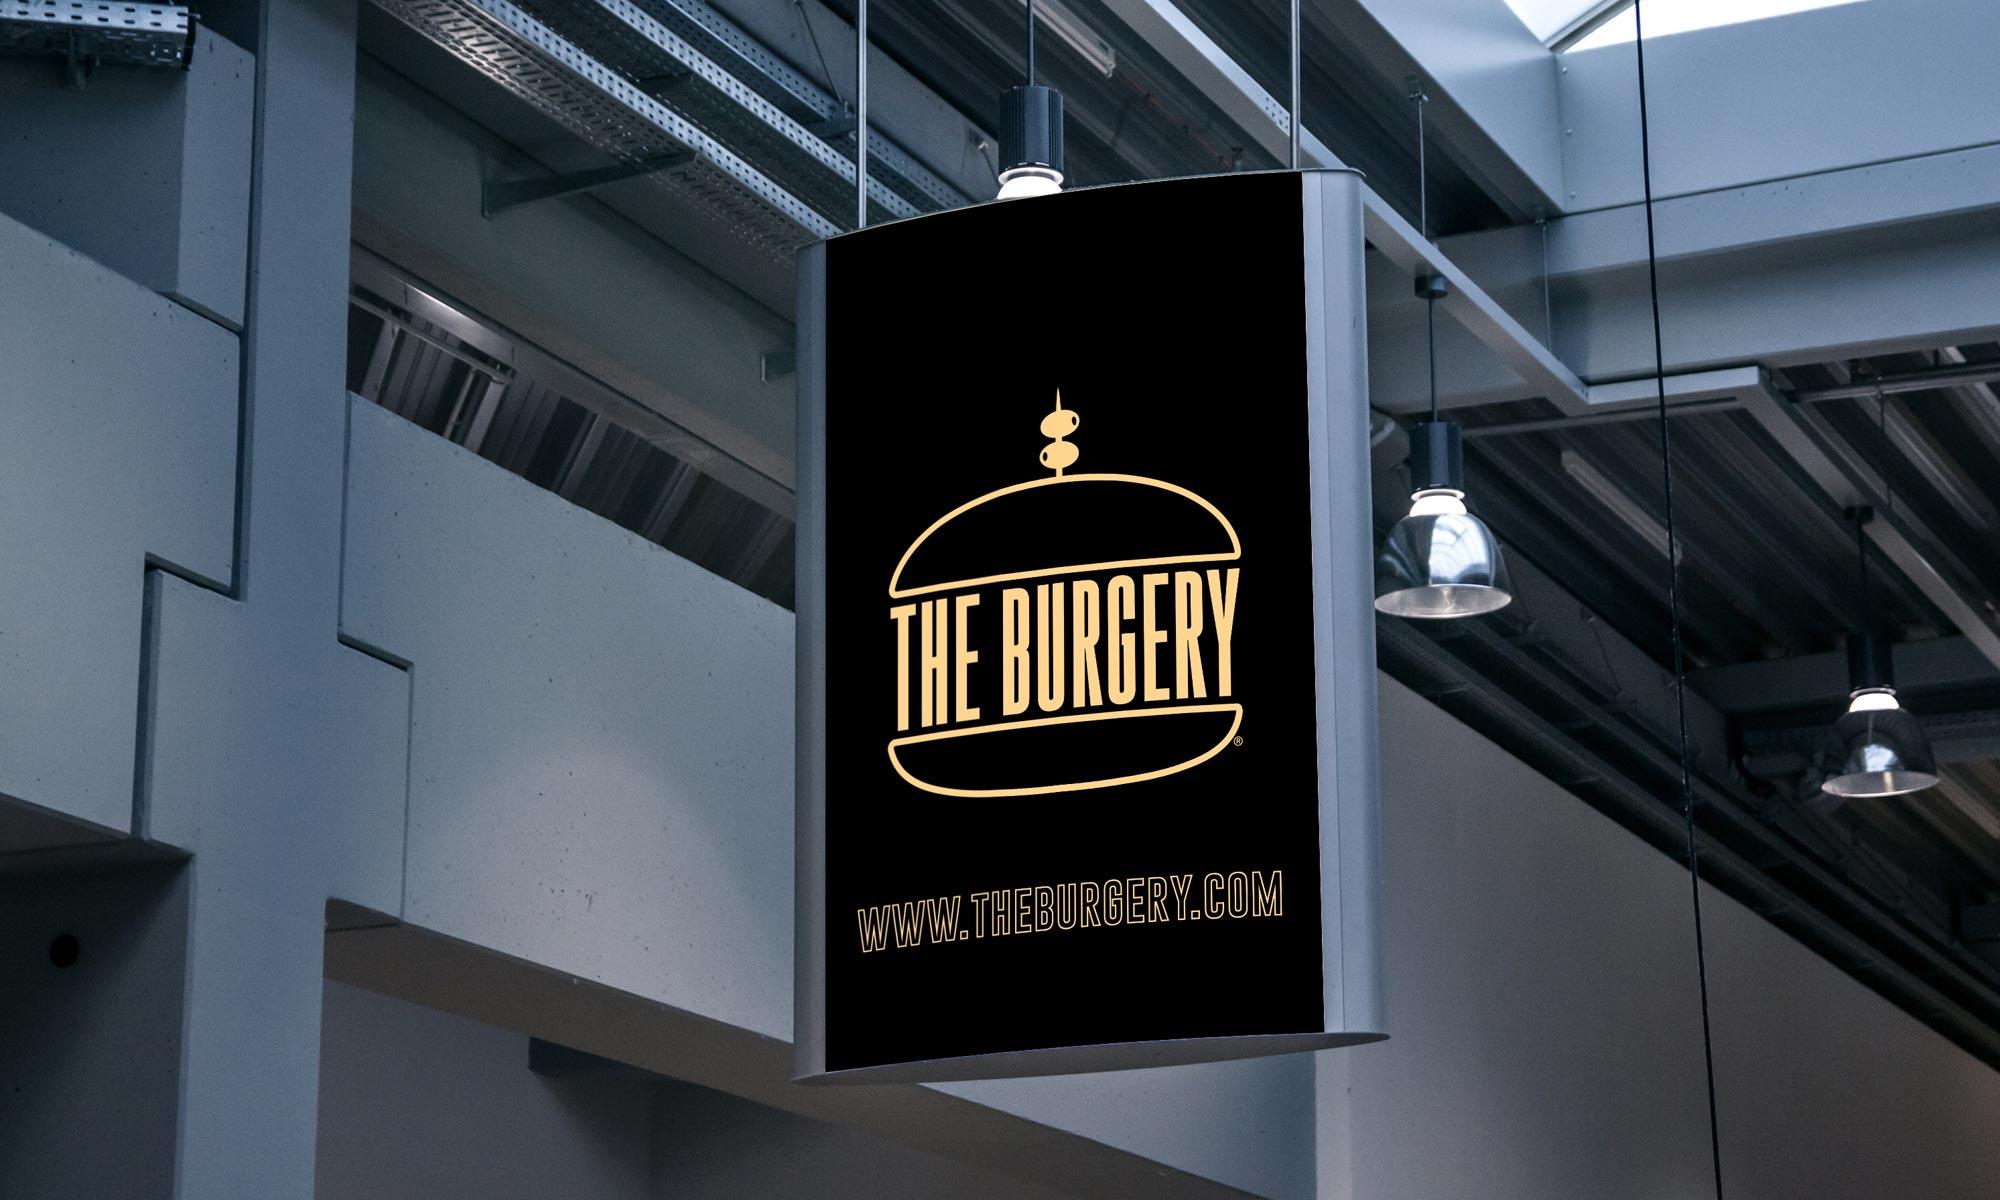 https://www.atelierzoz.com/wp-content/uploads/2020/03/works_theburgery-1.jpg